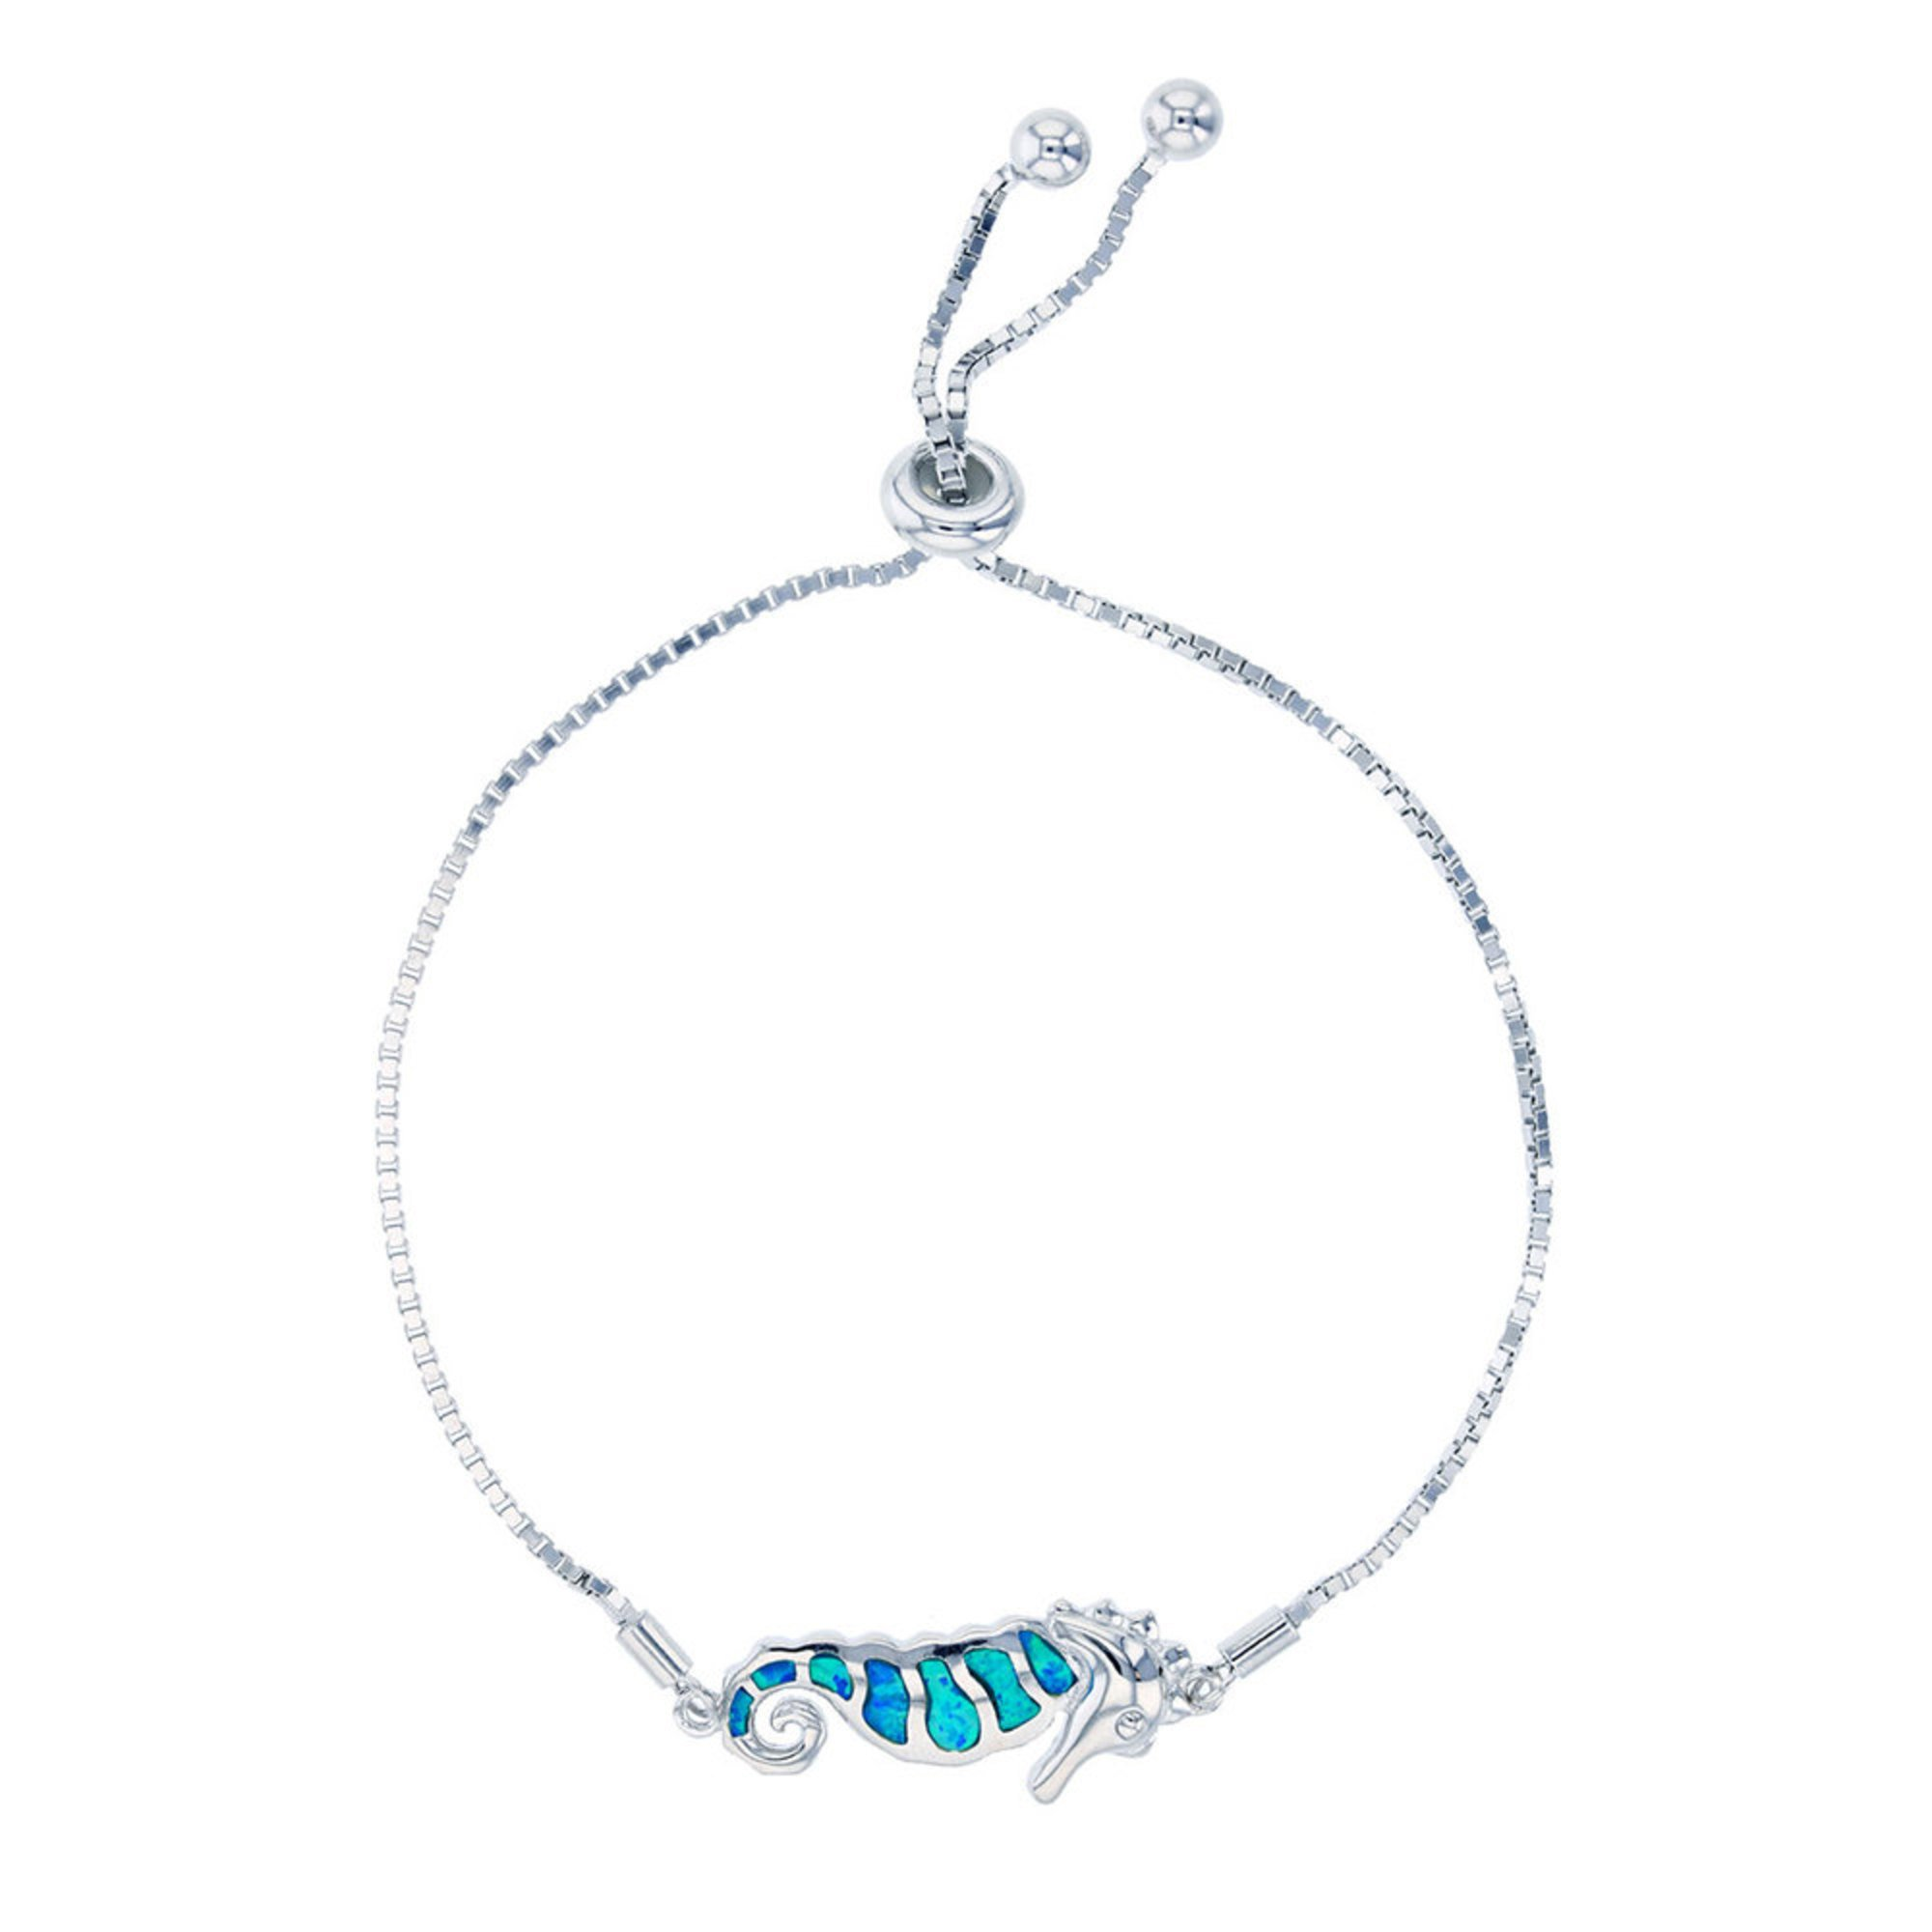 Bijoux Du Soleil Created Opal Seahorse Bracelet, Sterling